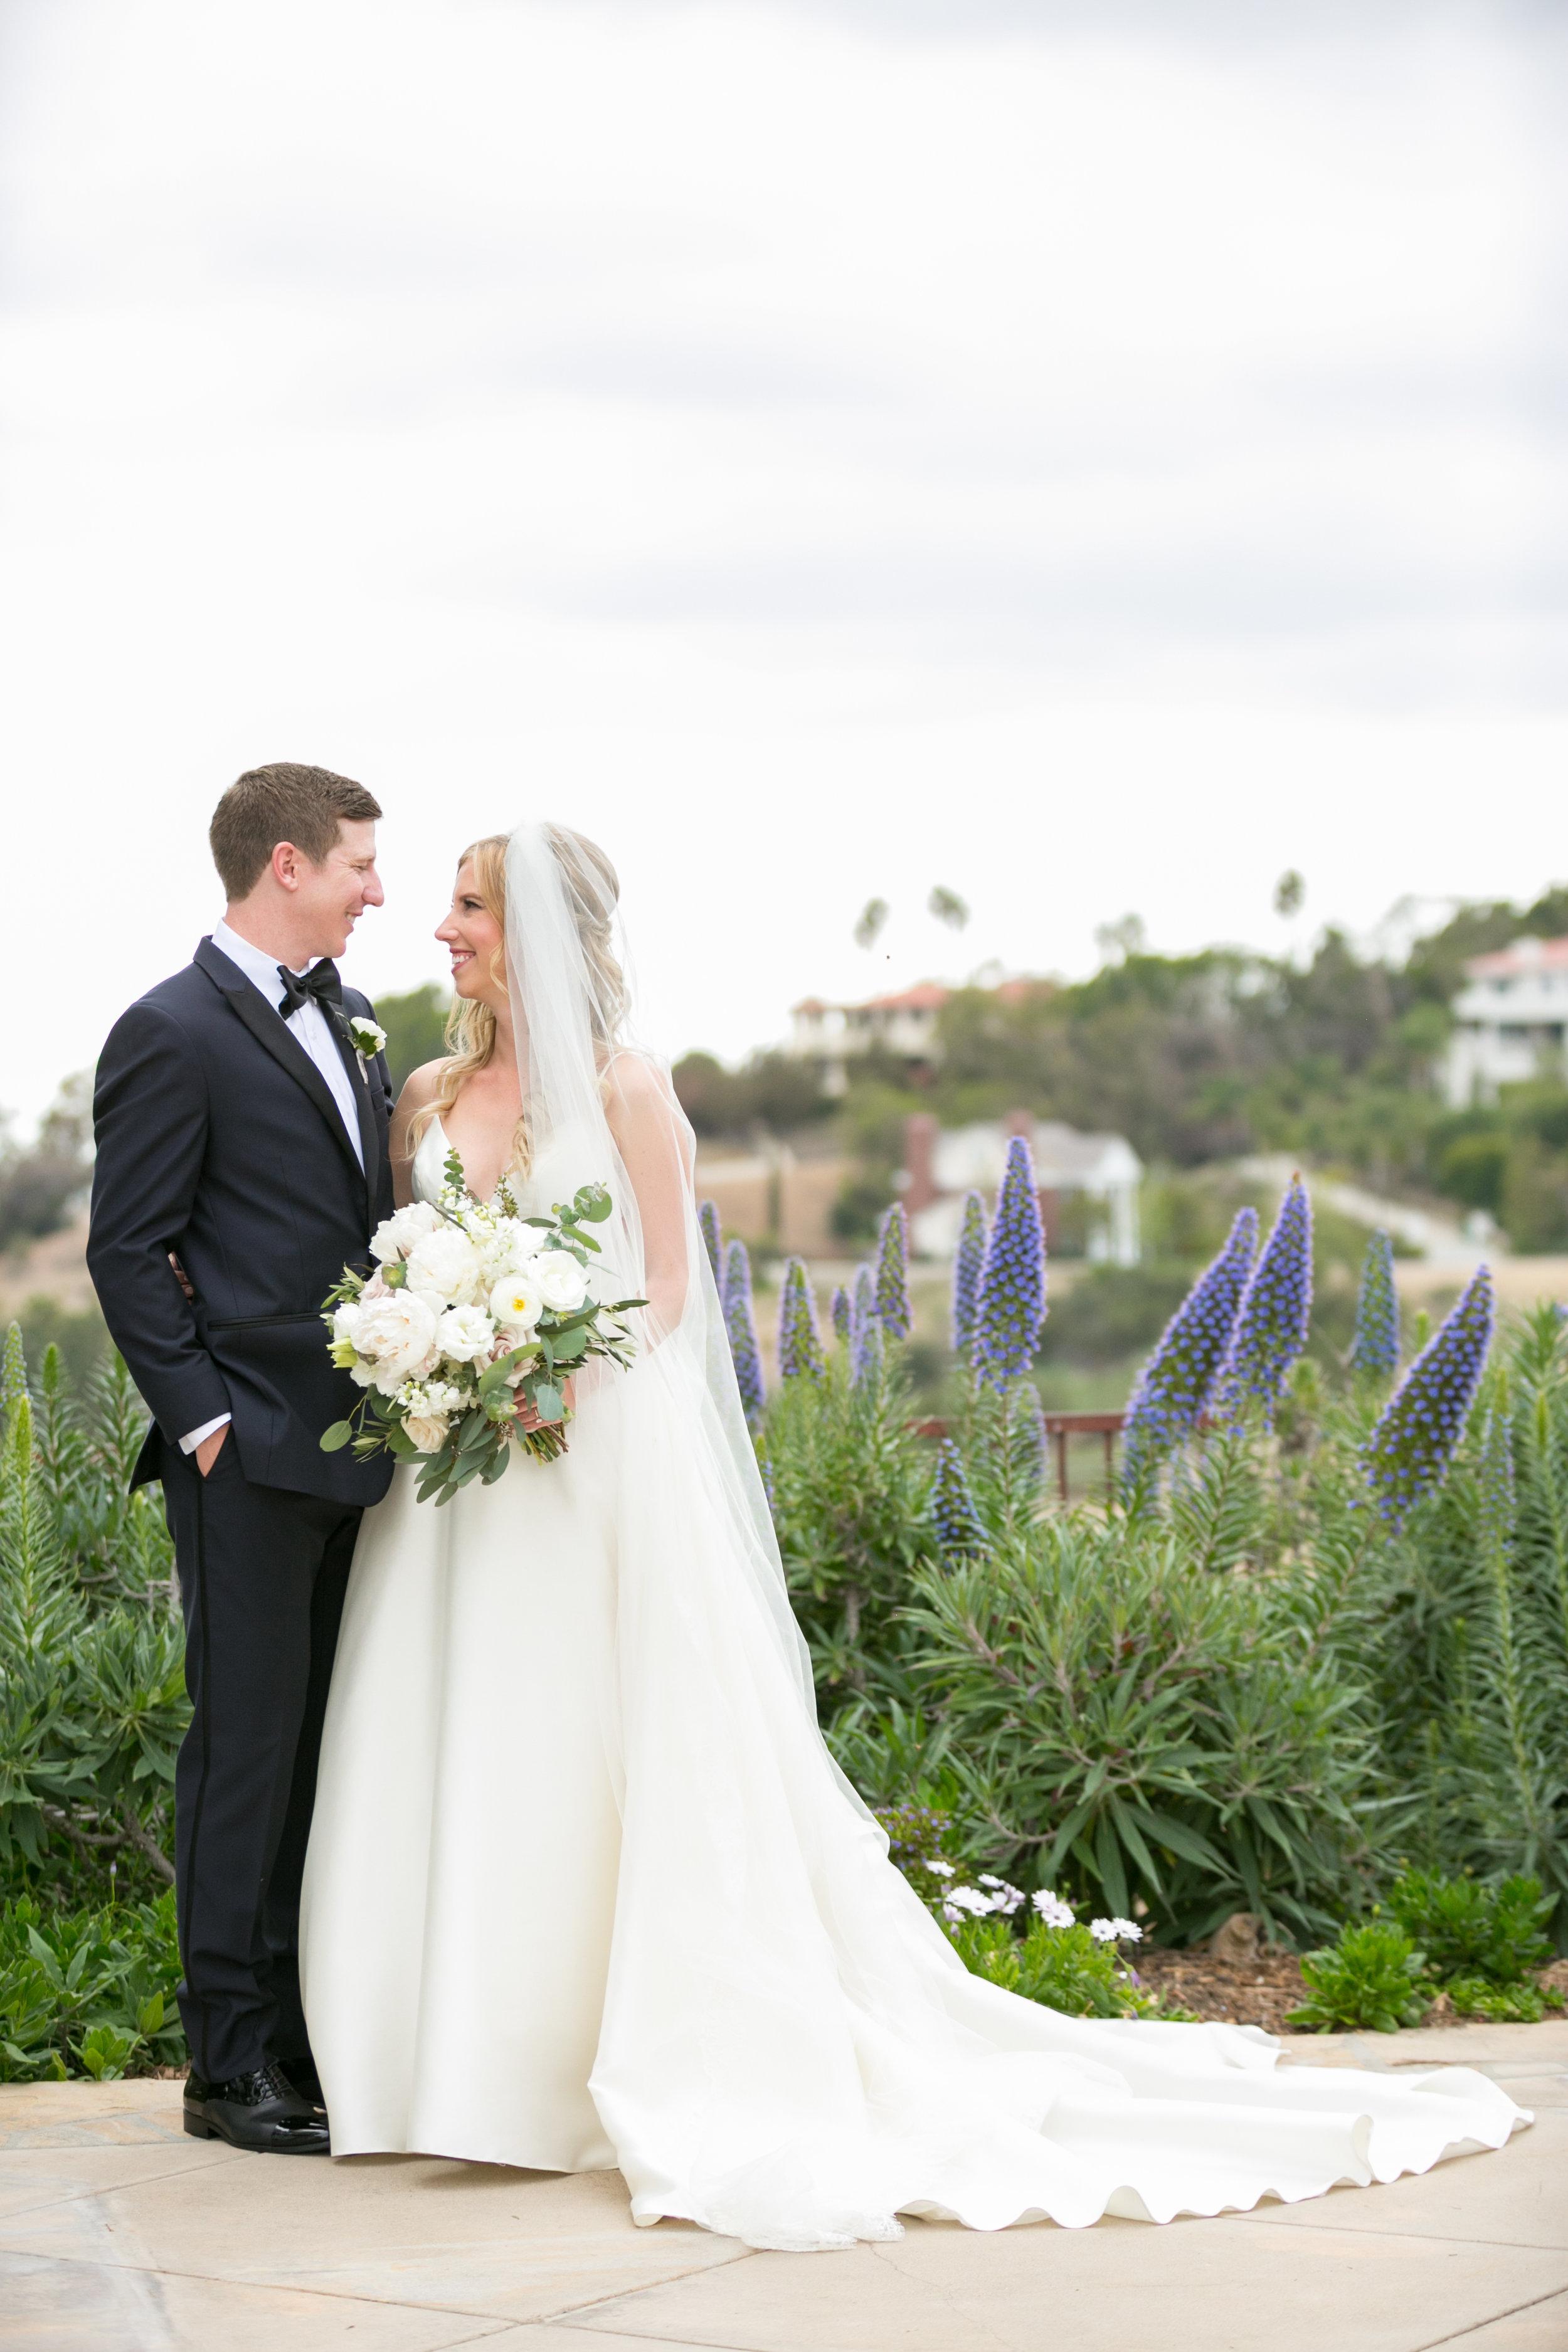 Jaosn Snorlax Photography Kyle & Jacqueline Wedding-77.jpg